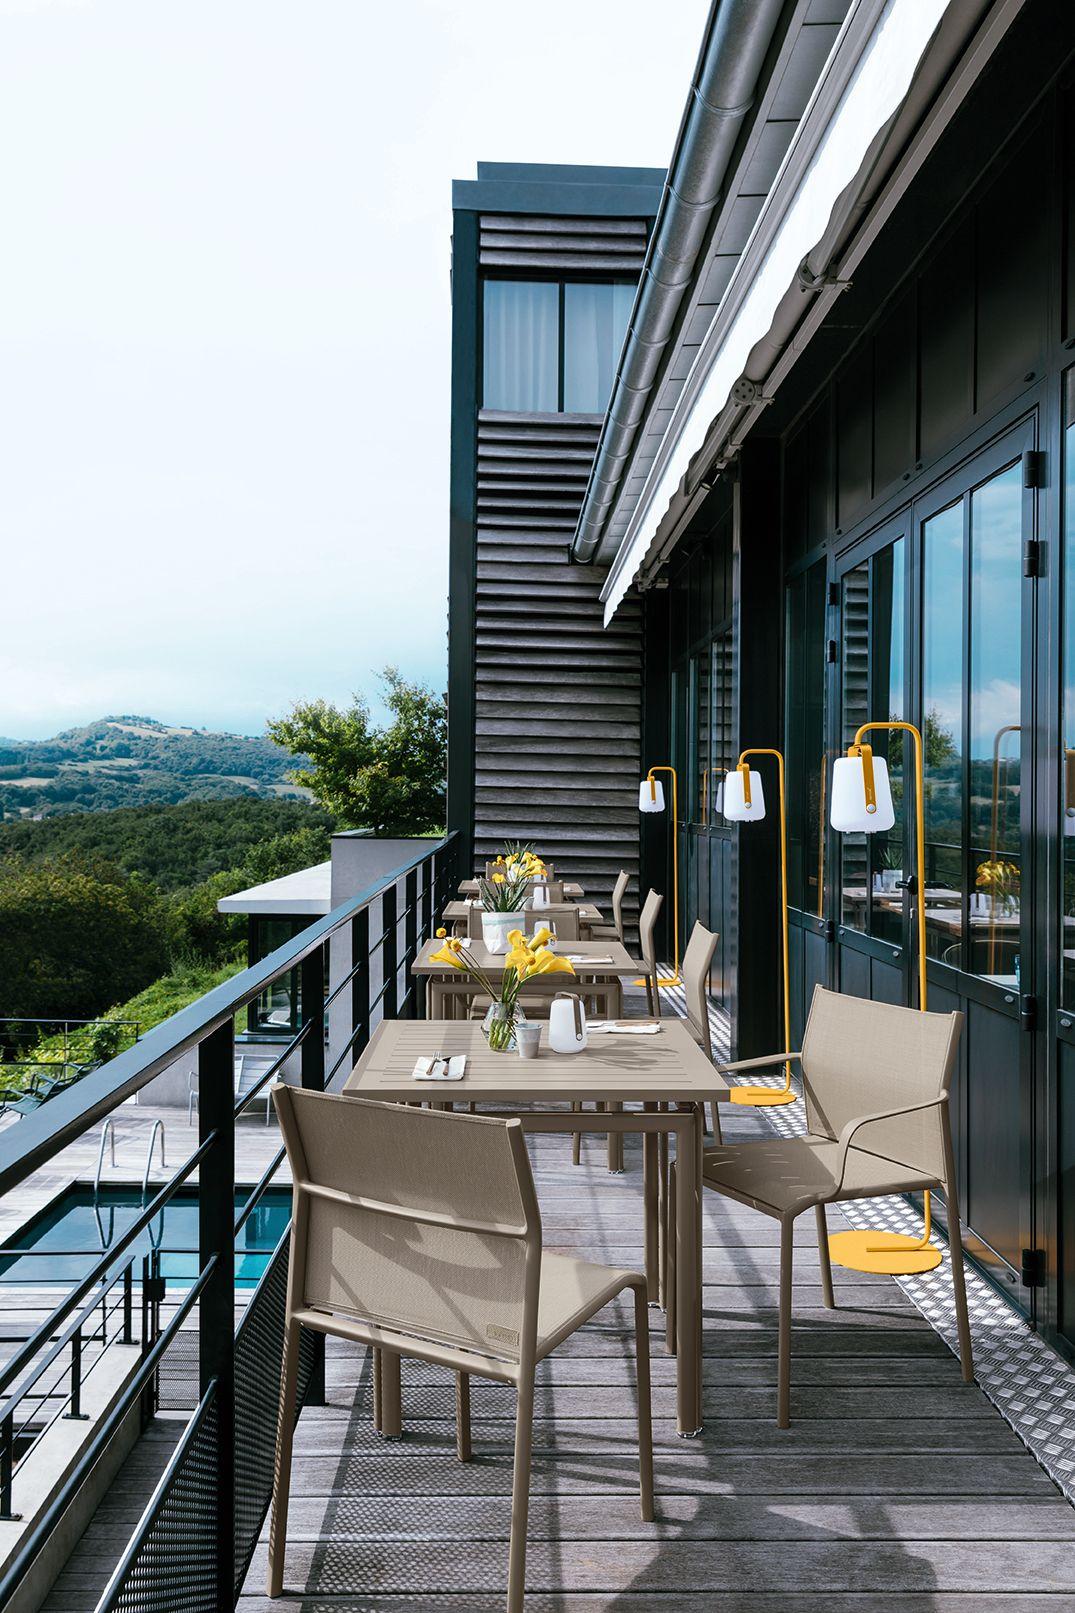 mobilier #professionnel #hotel #exterieur #outdoor #solide ...